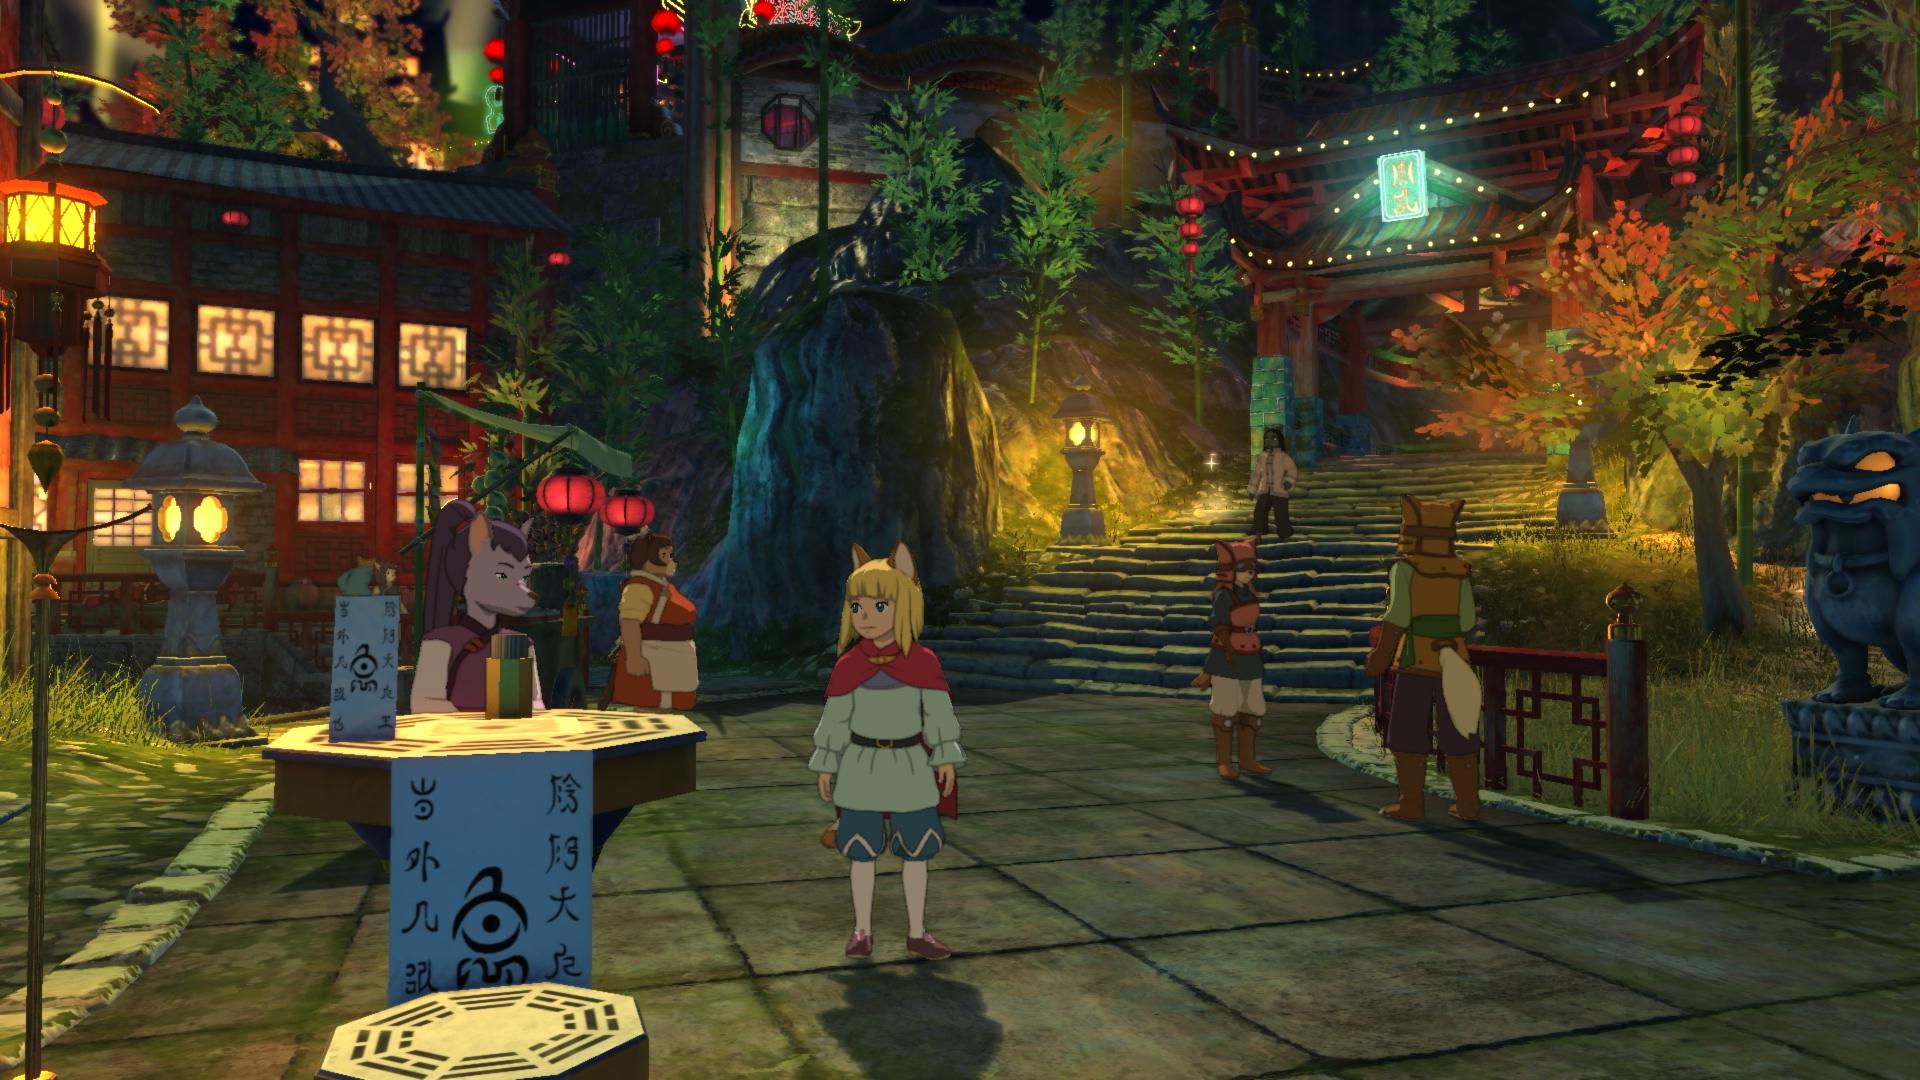 Ni no Kuni II: Revenant Kingdom v traileru a na screenshotech pro letošní Gamescom 148577